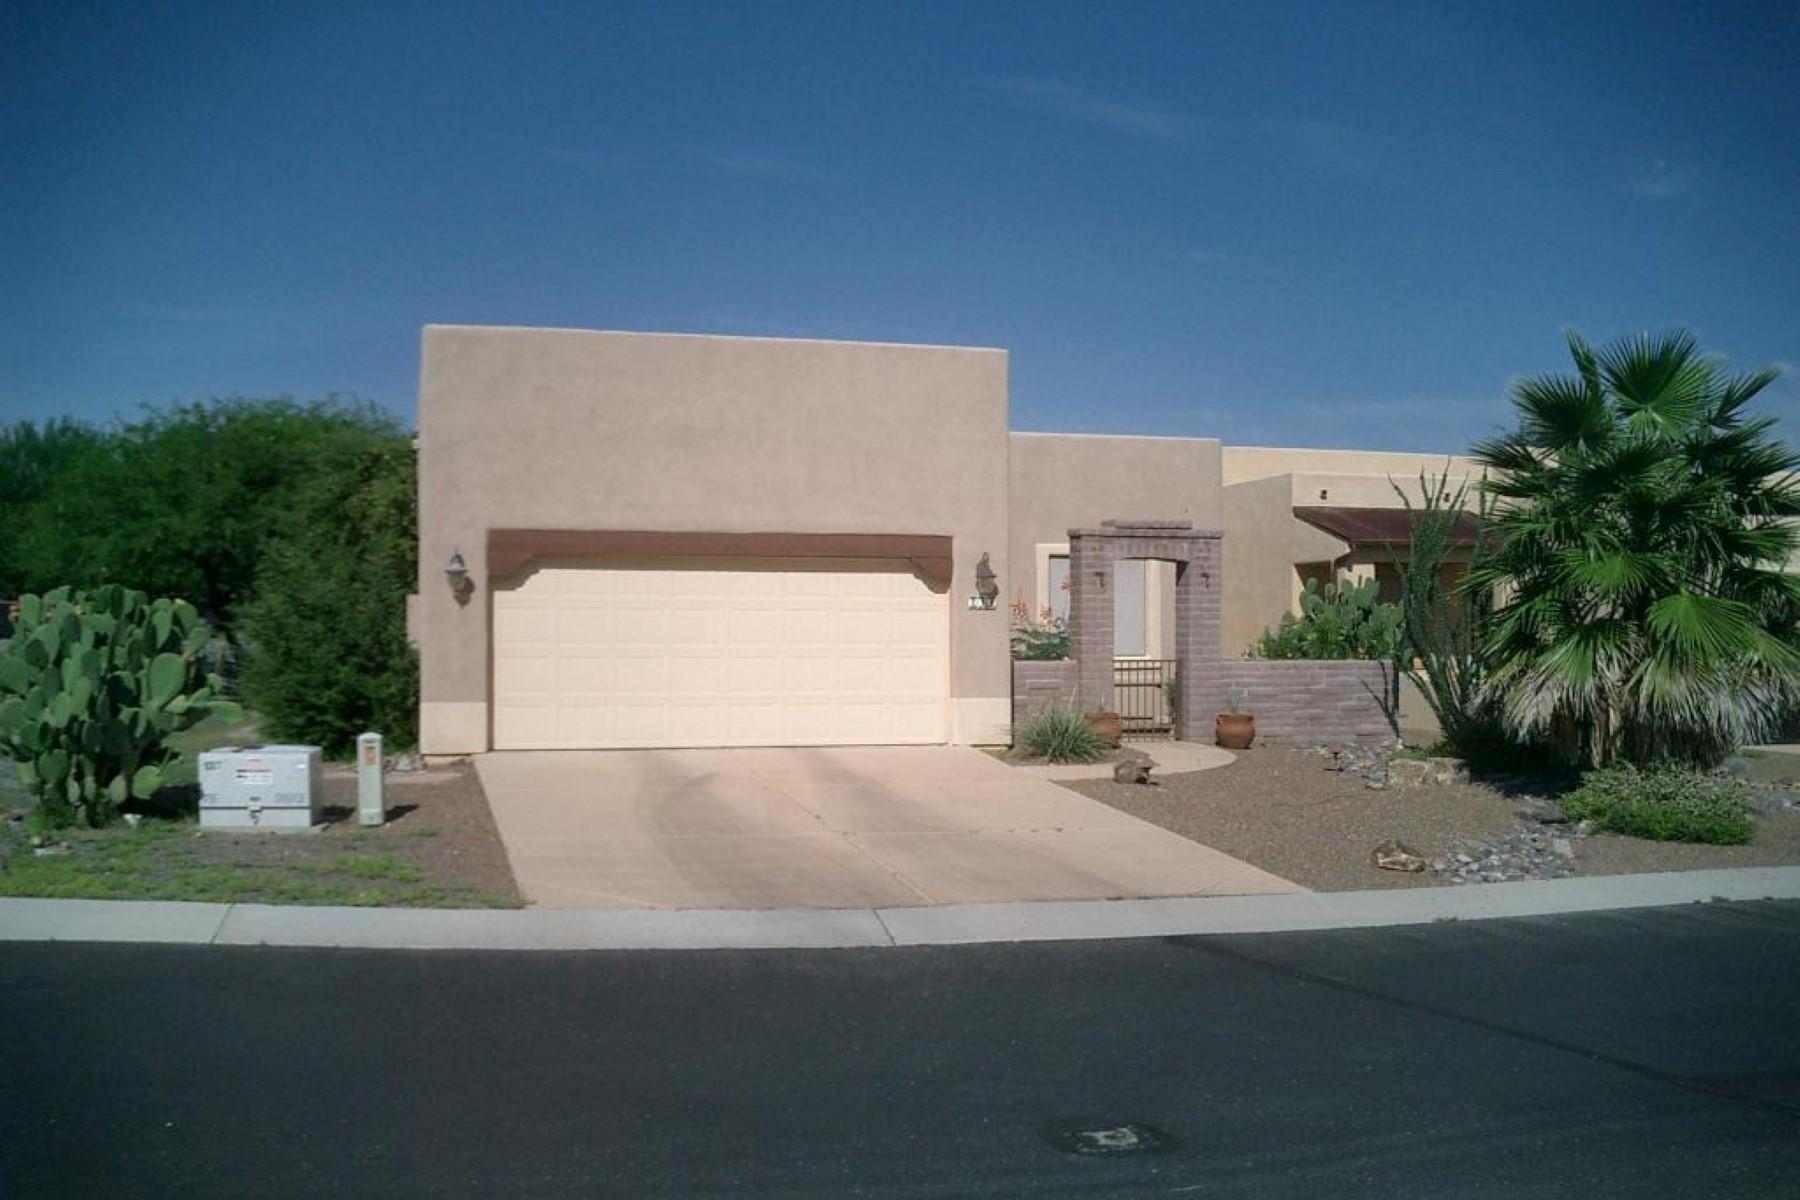 Single Family Home for Sale at Beautiful St. Francis Patio home 241 Market Tubac, Arizona, 85646 United States